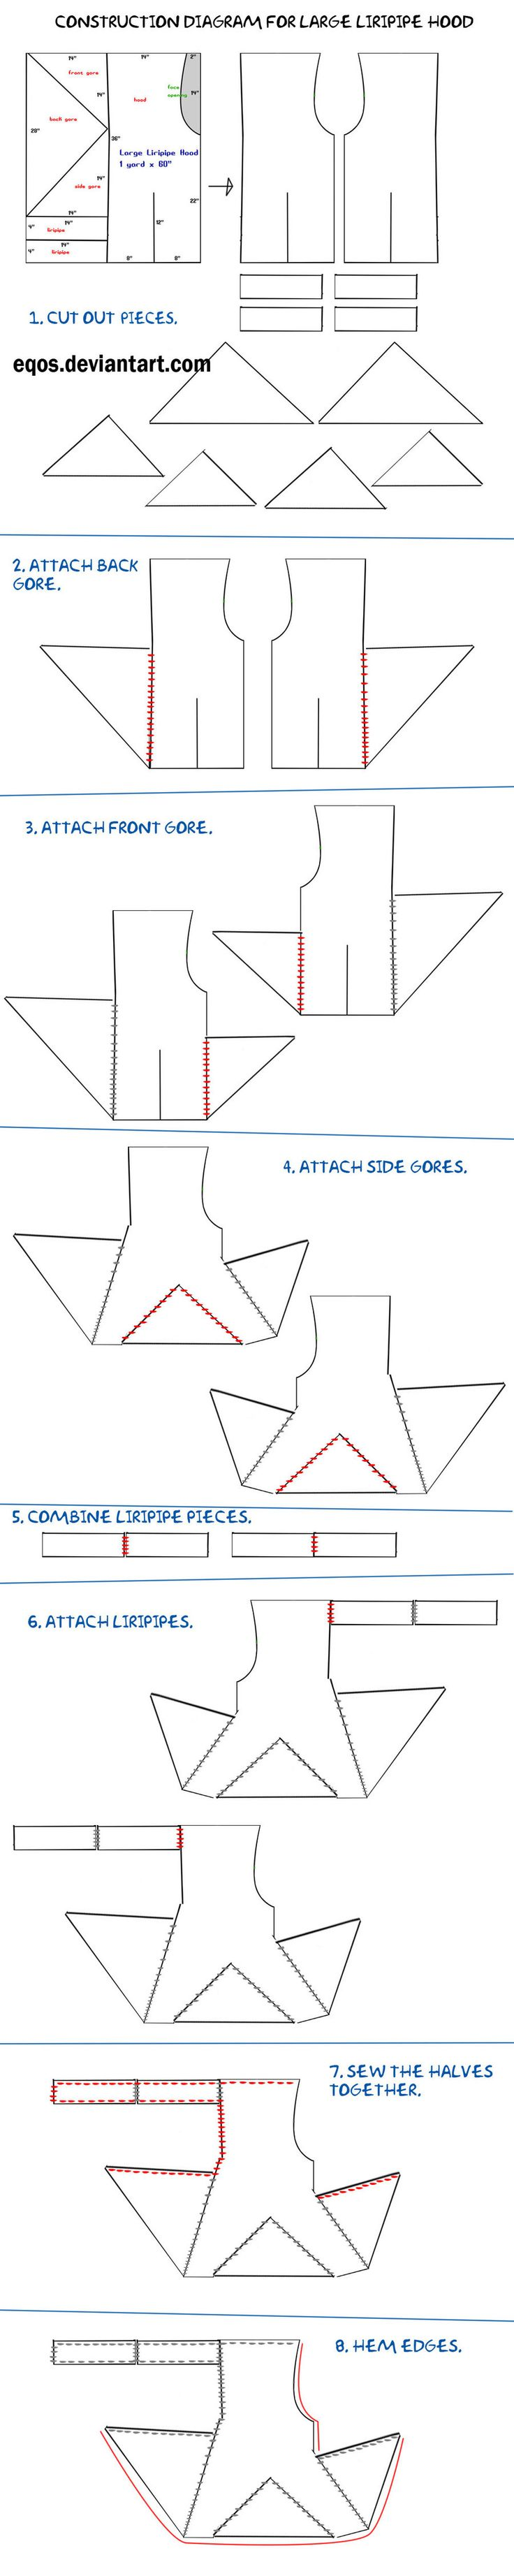 diagram instructions for large hood by eqos deviantart com on deviantart [ 736 x 3688 Pixel ]